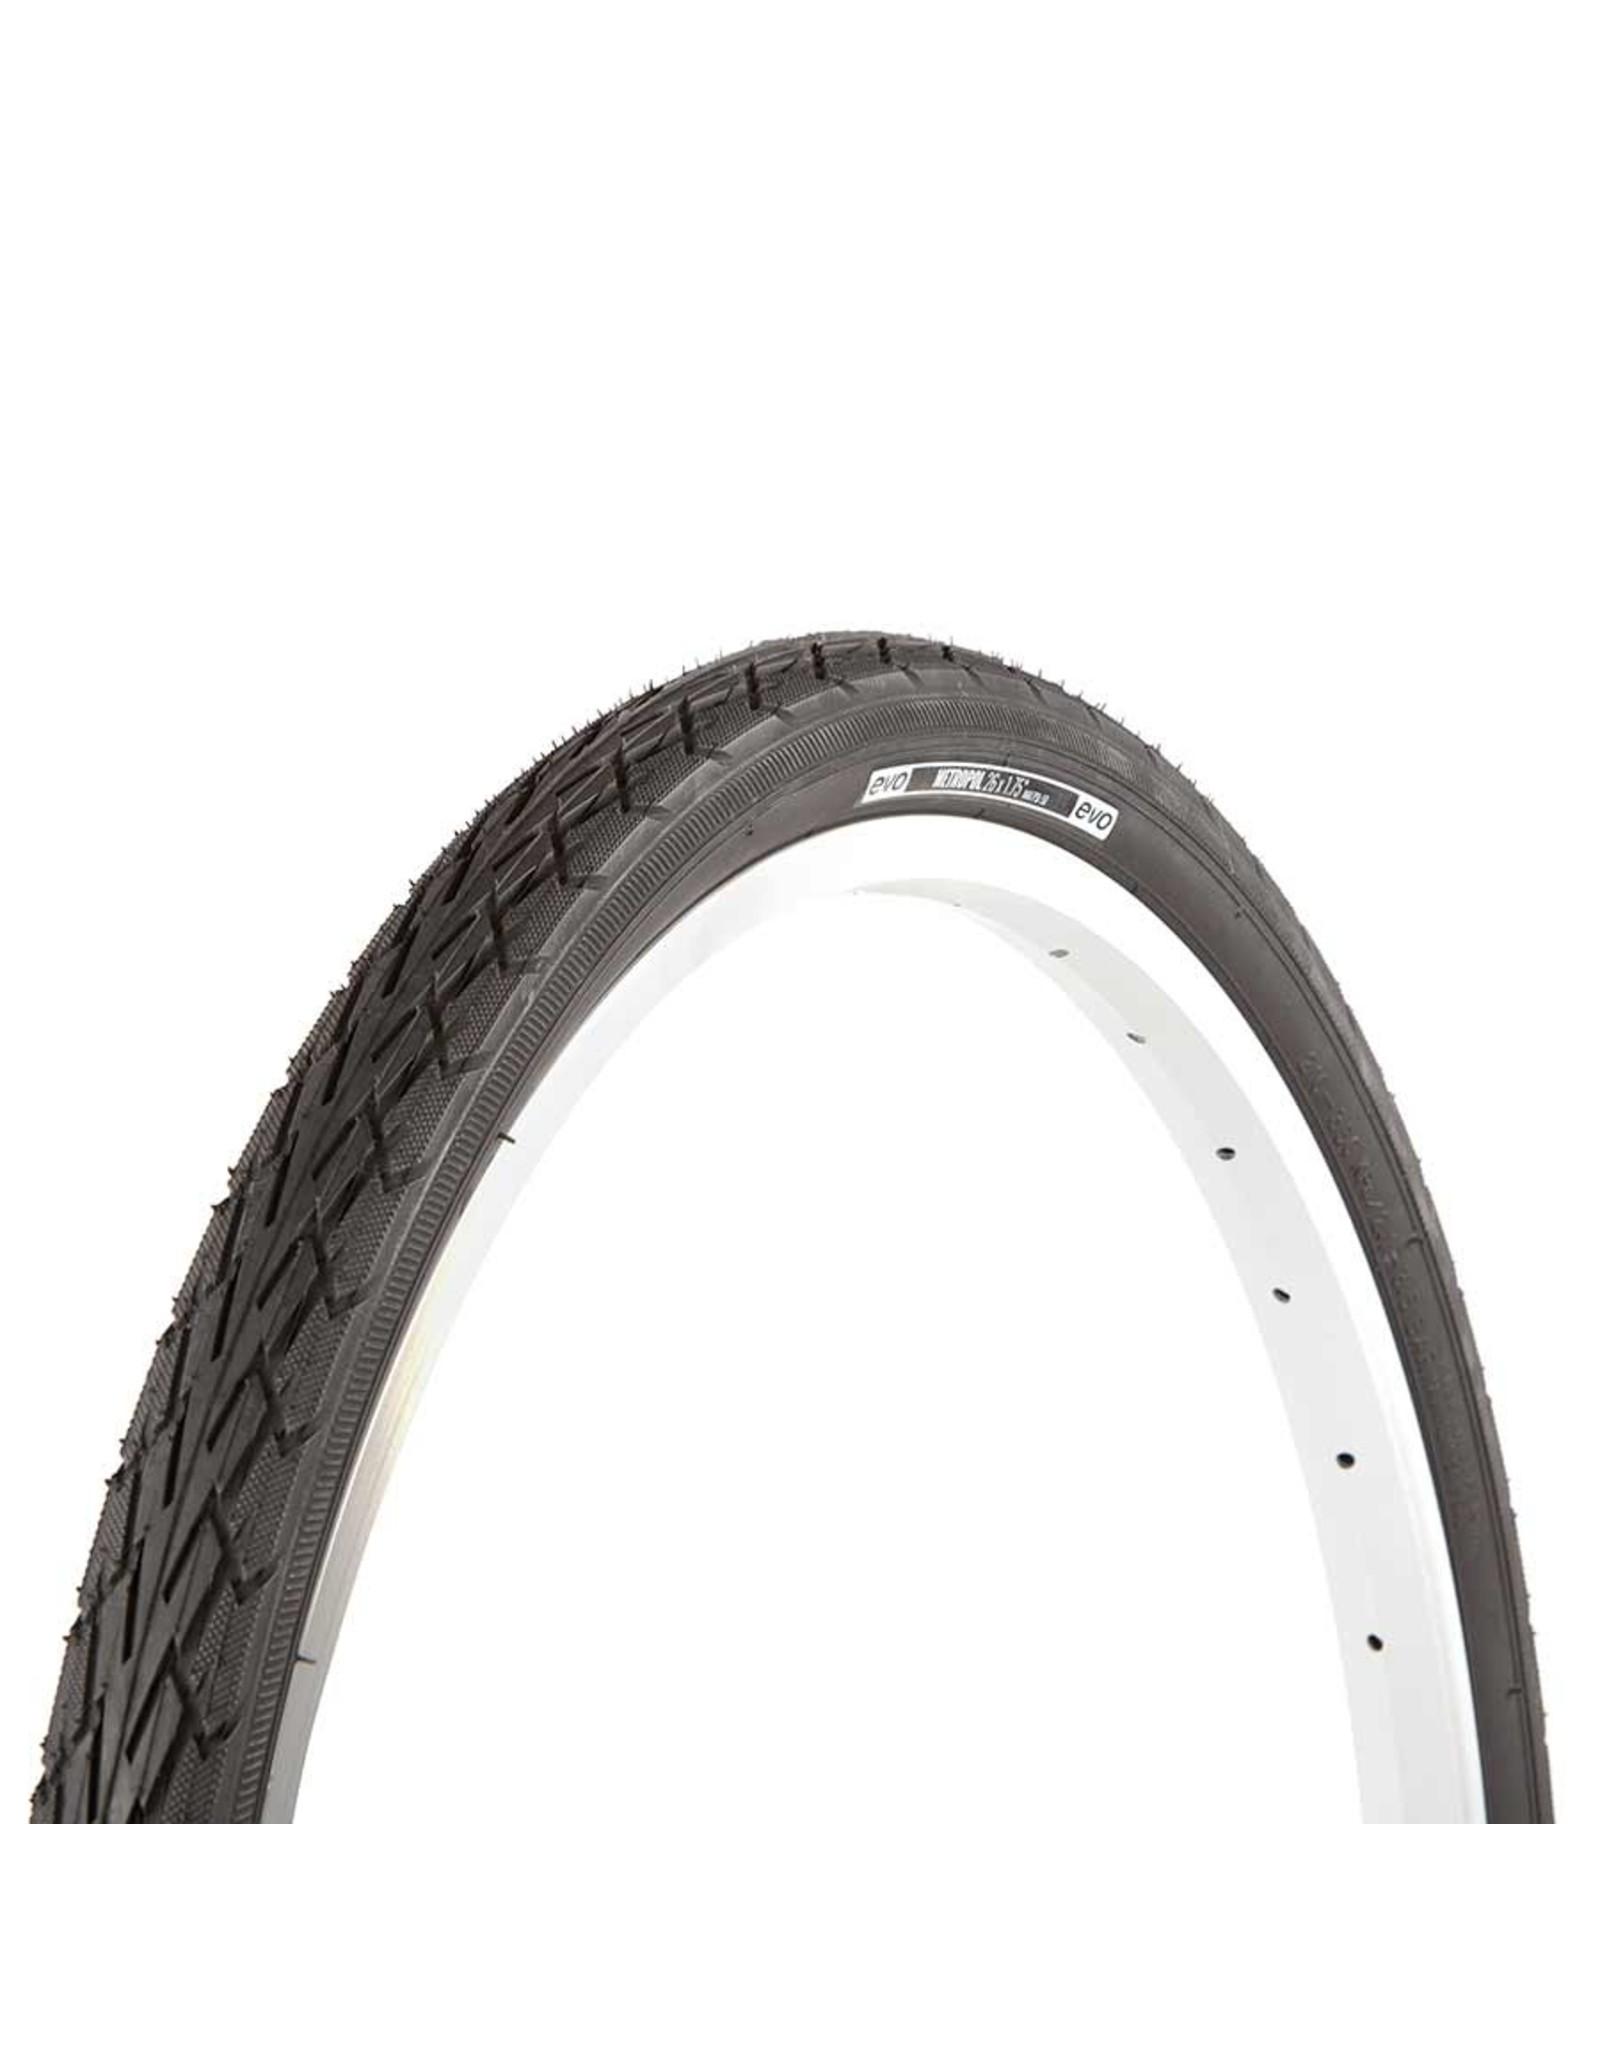 EVO, Metropol, Tire, 700x35C, Wire, Clincher, Black